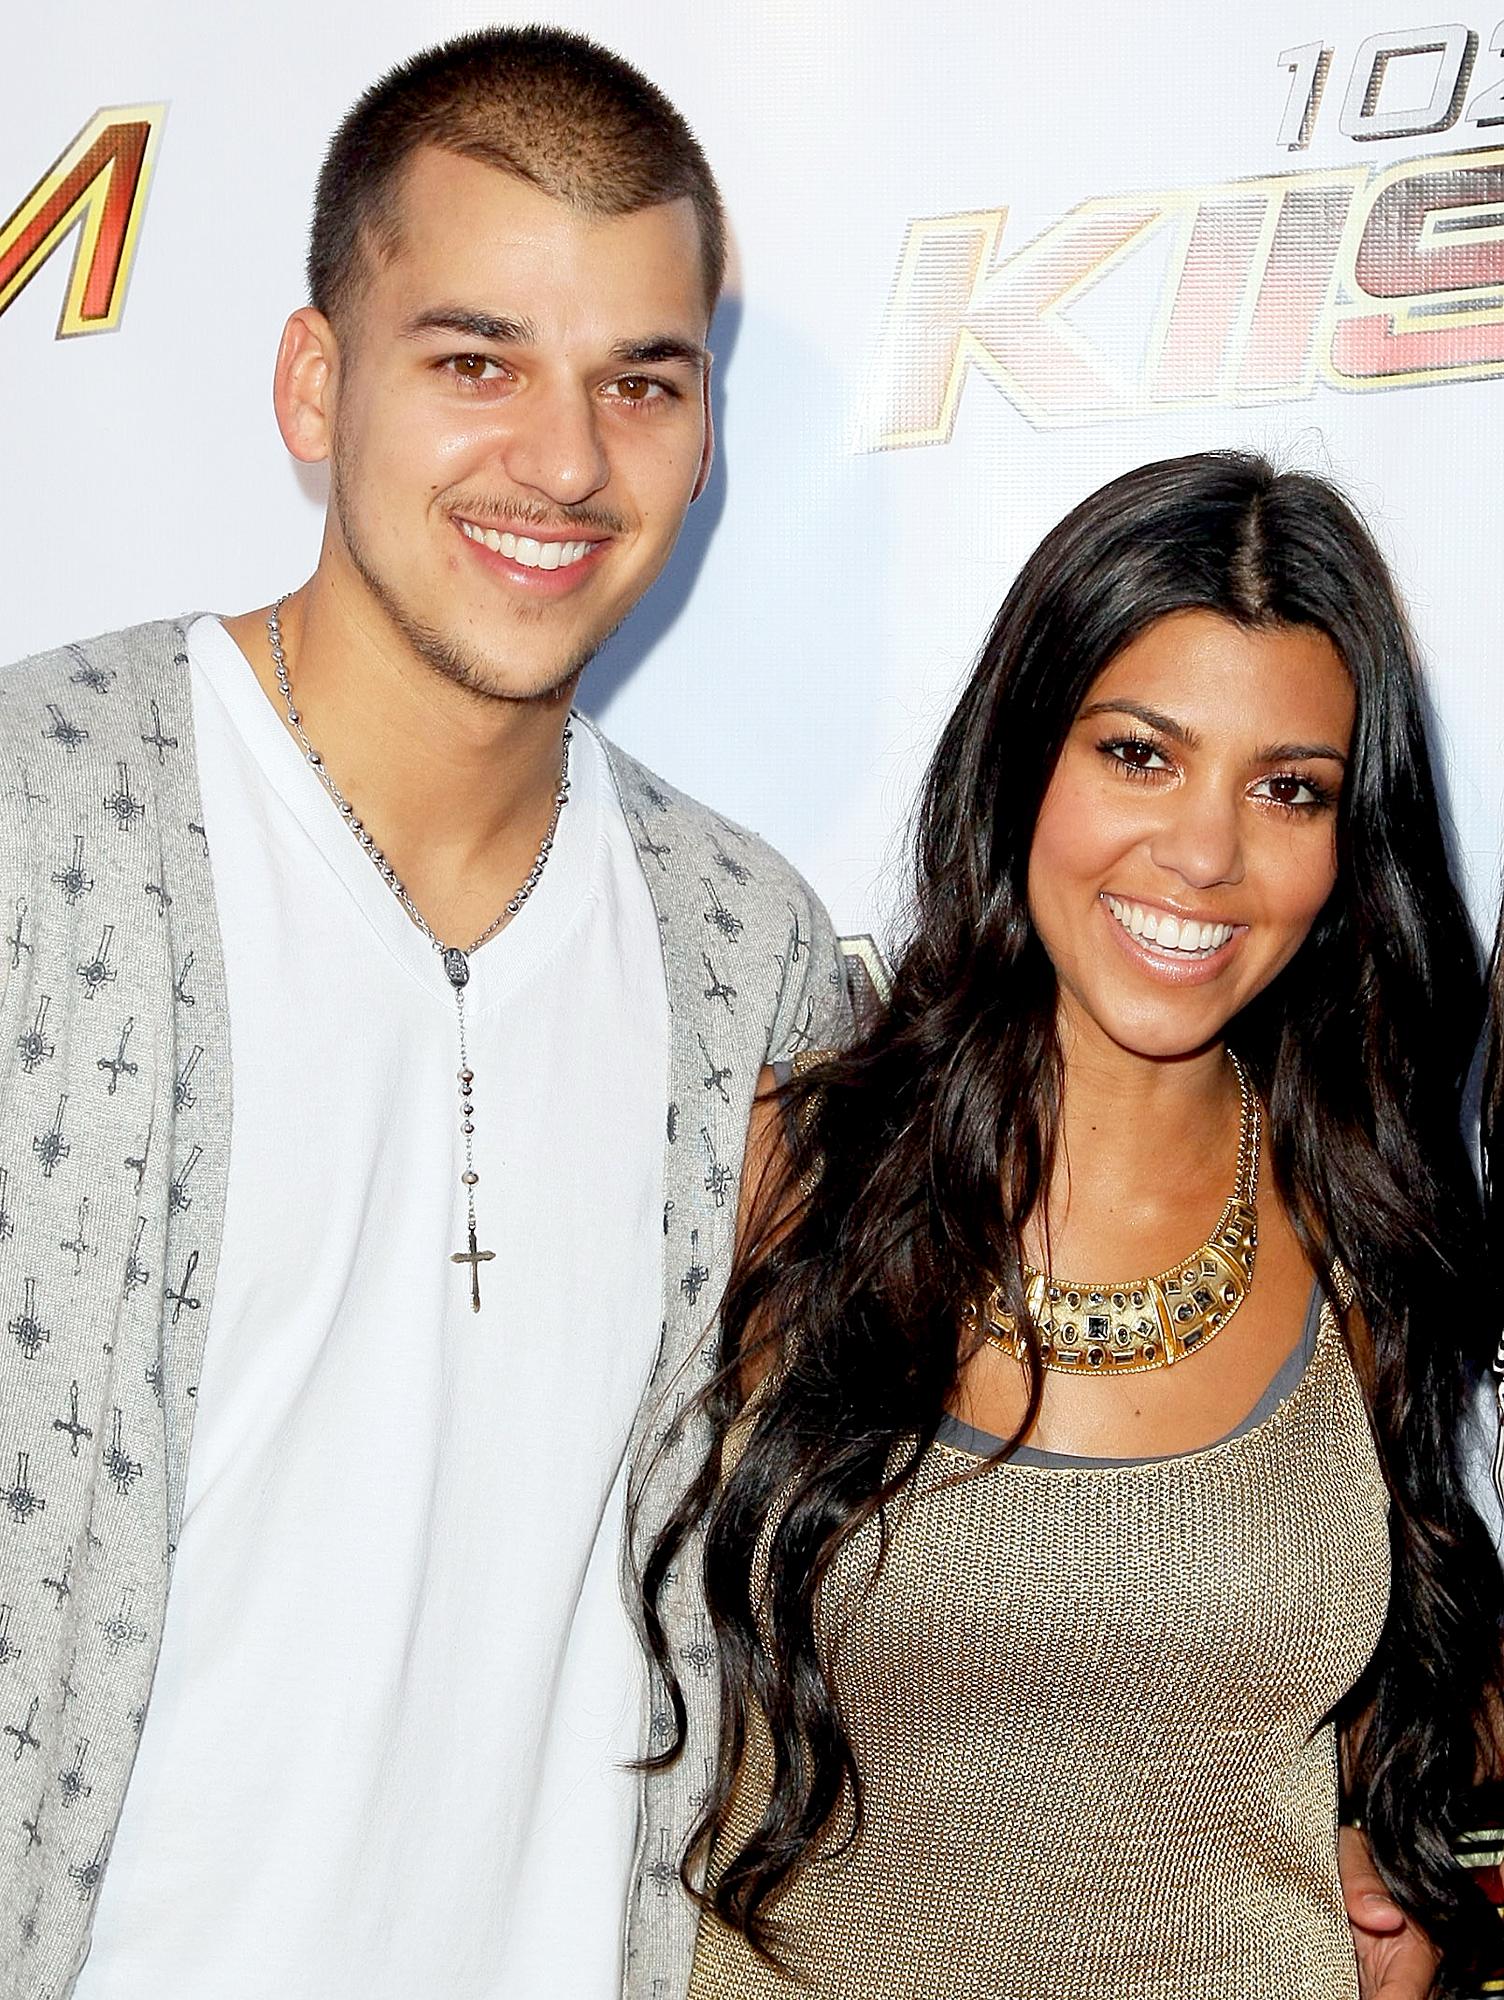 Rob Kardashian and Kourtney Kardashian